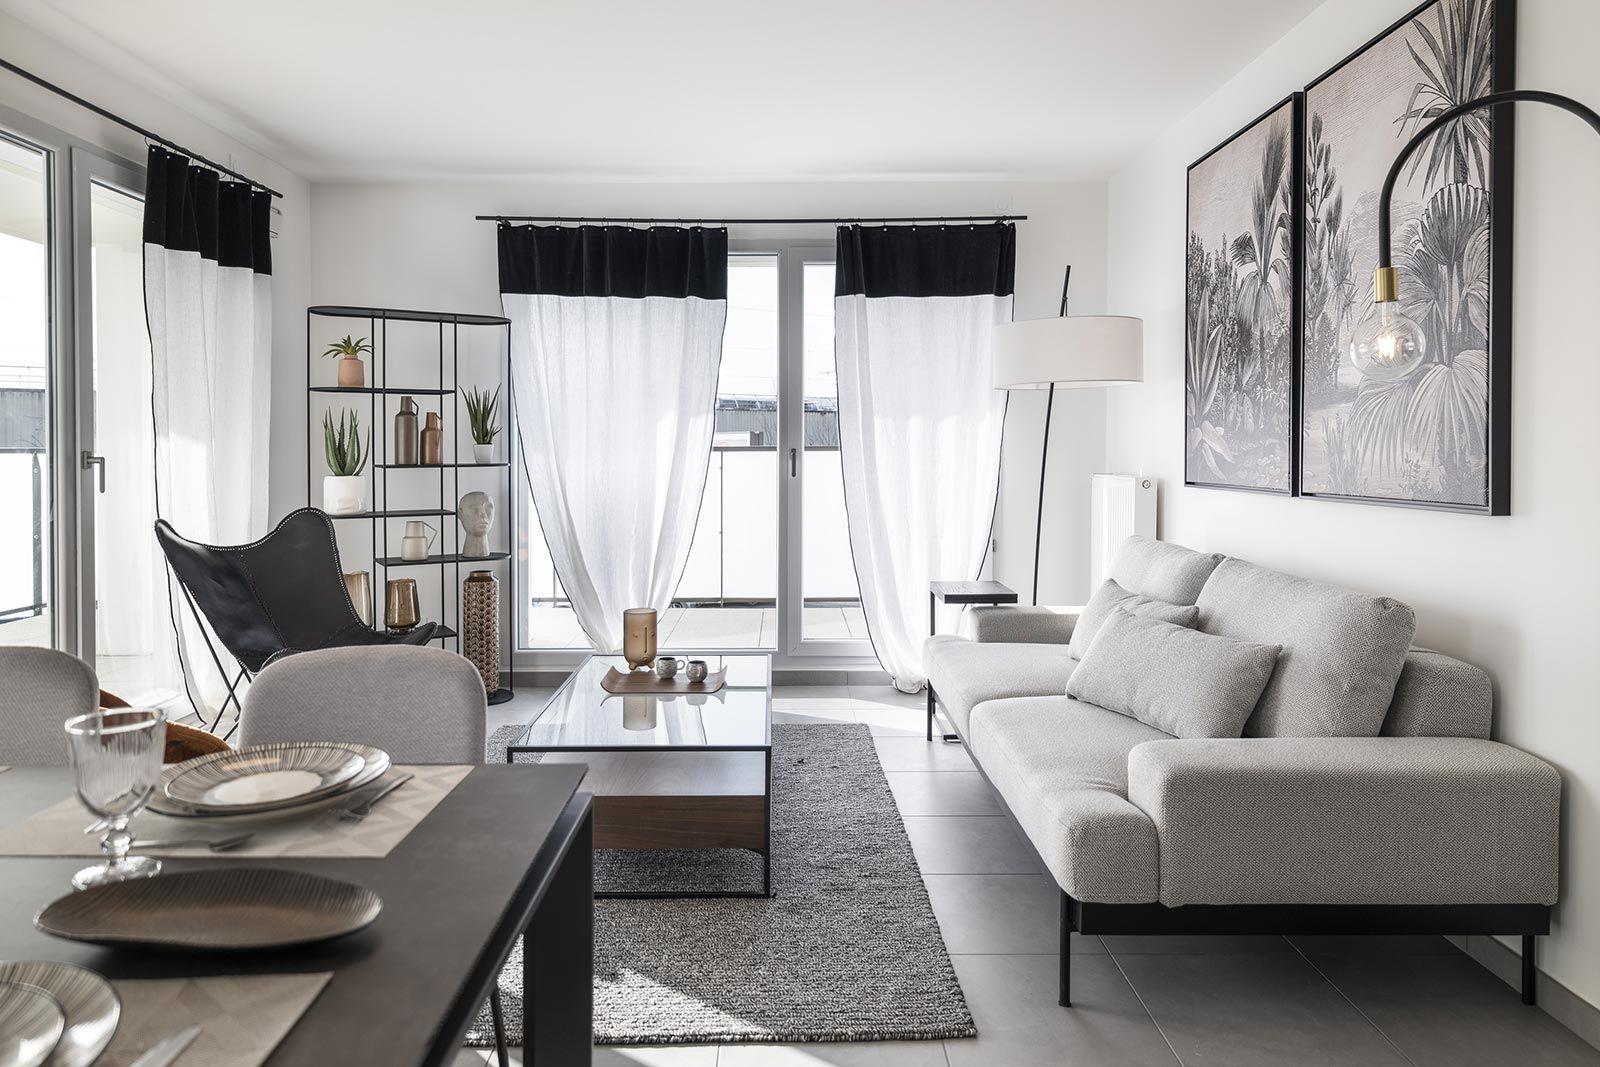 Interior ambiance - sitting room